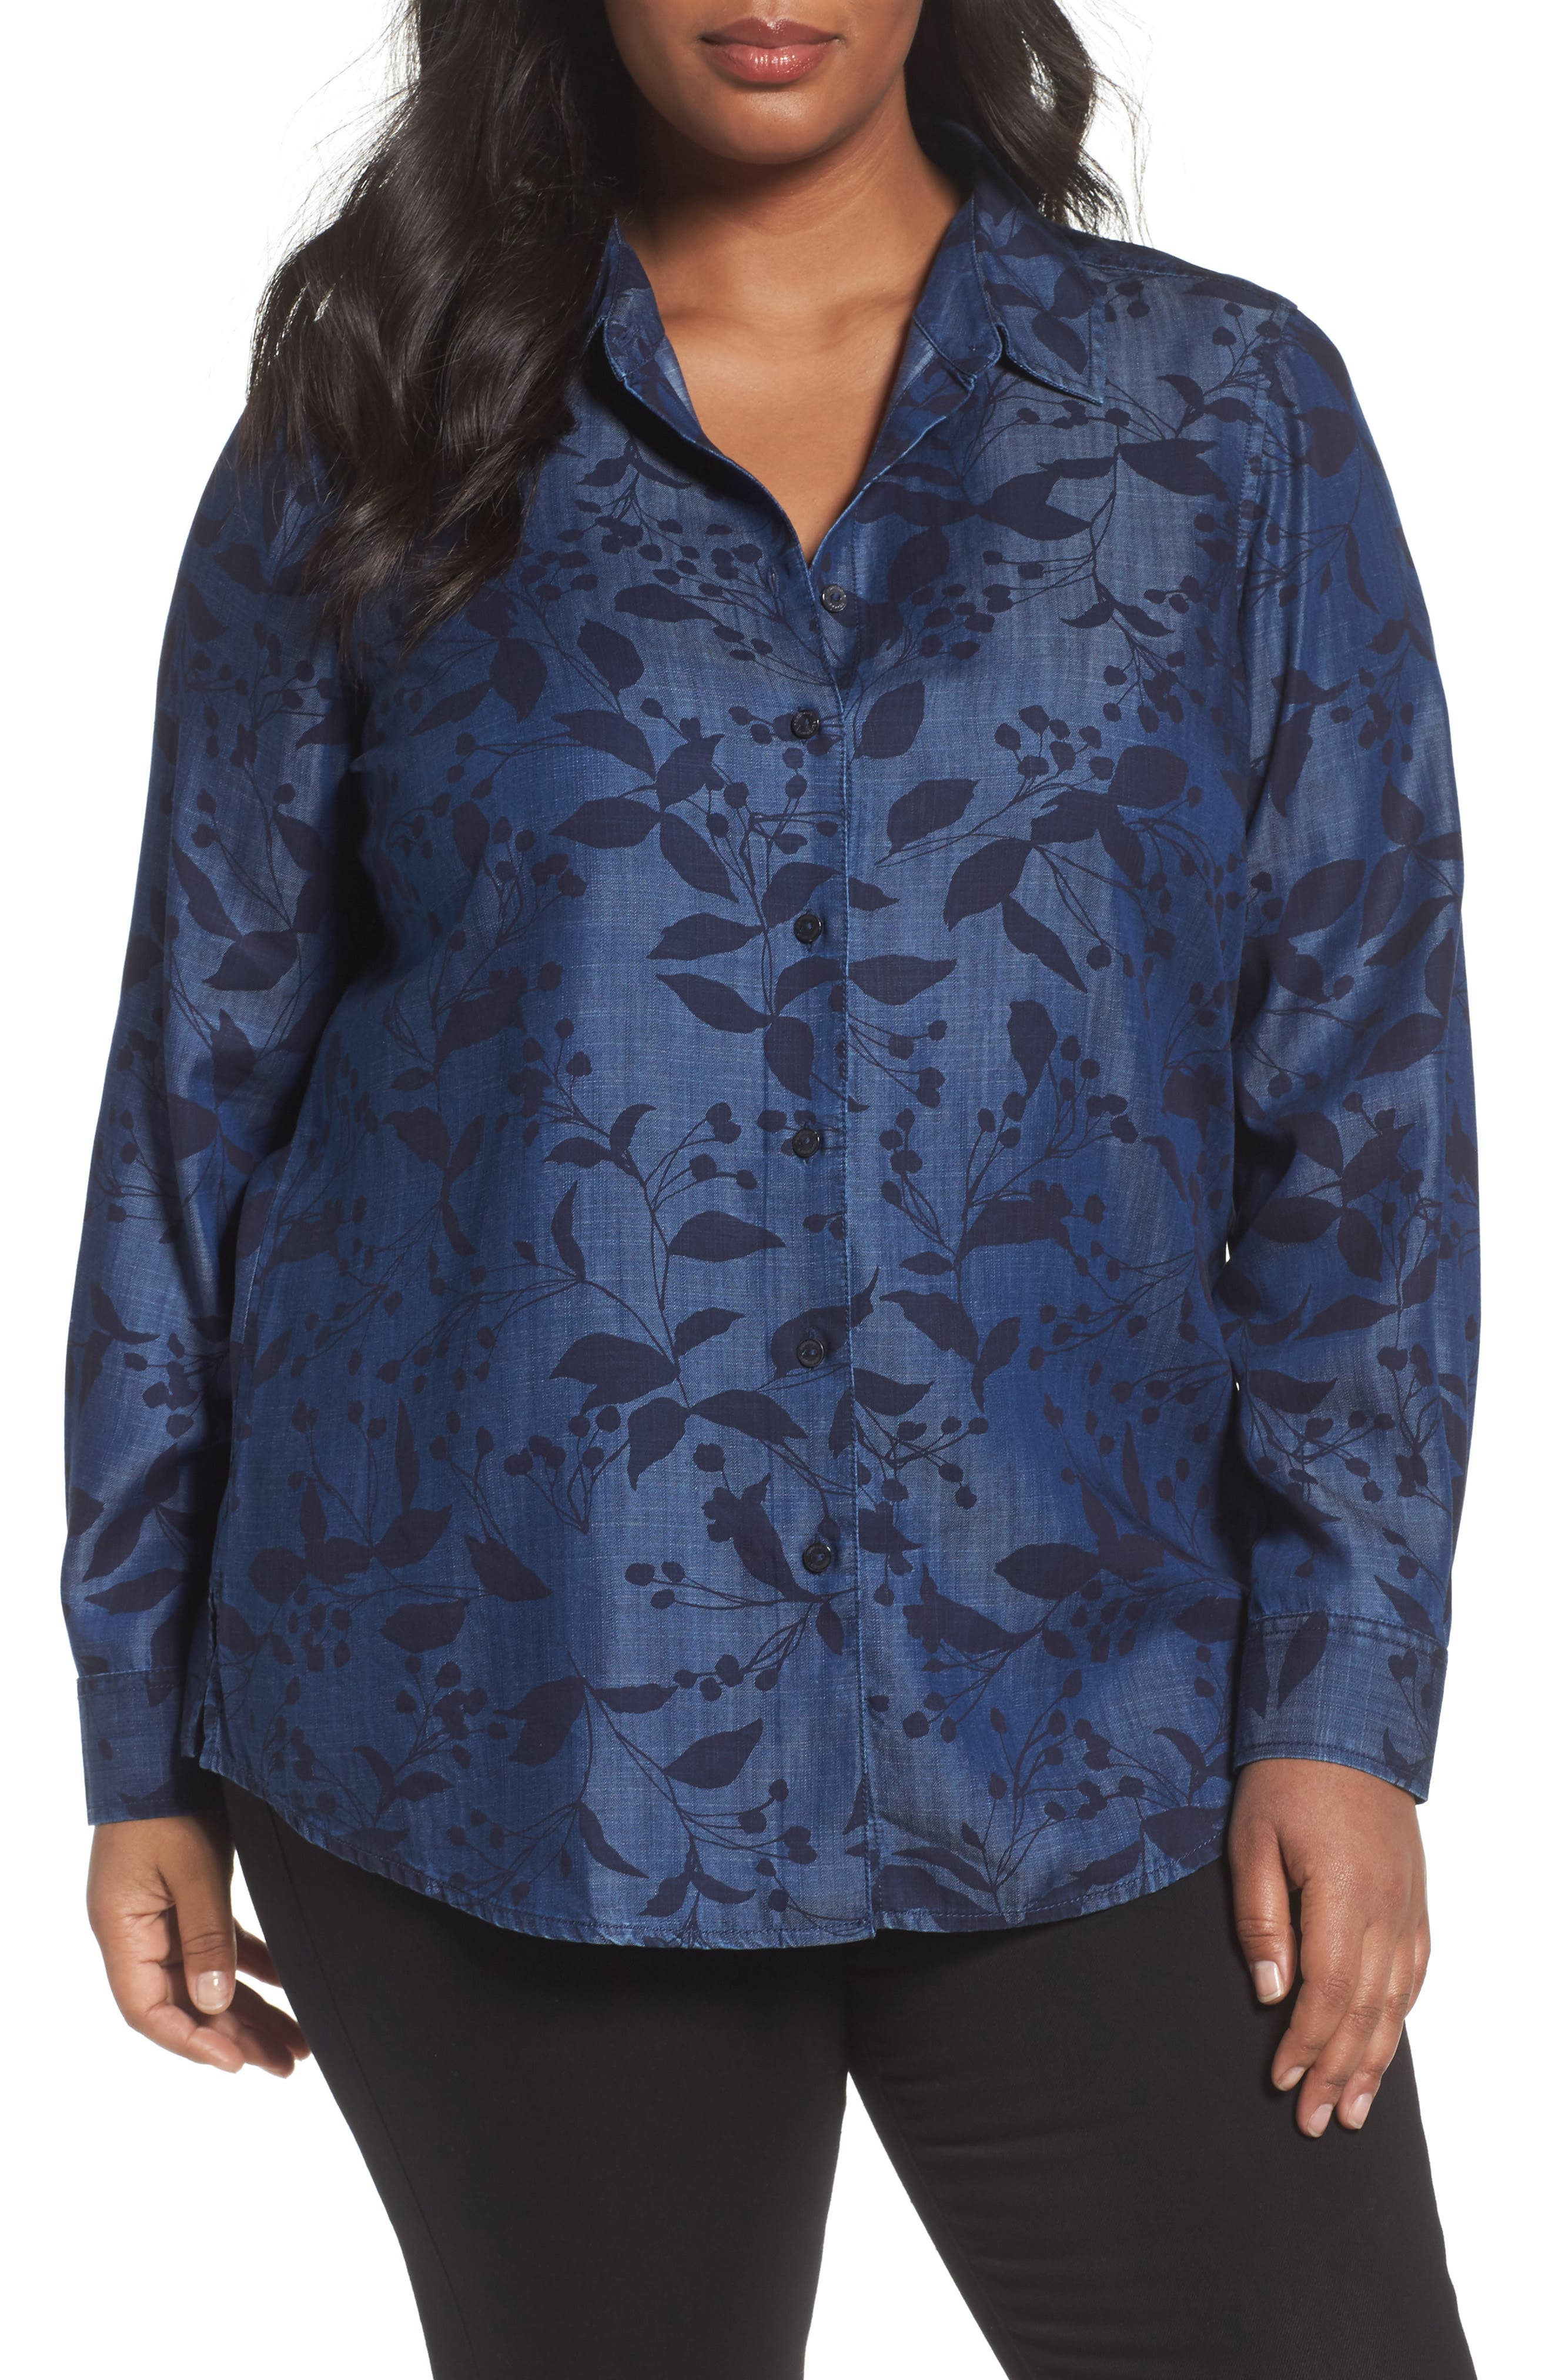 Main Image - Foxcroft Addison Floral Print Tencel® Shirt (Plus Size)